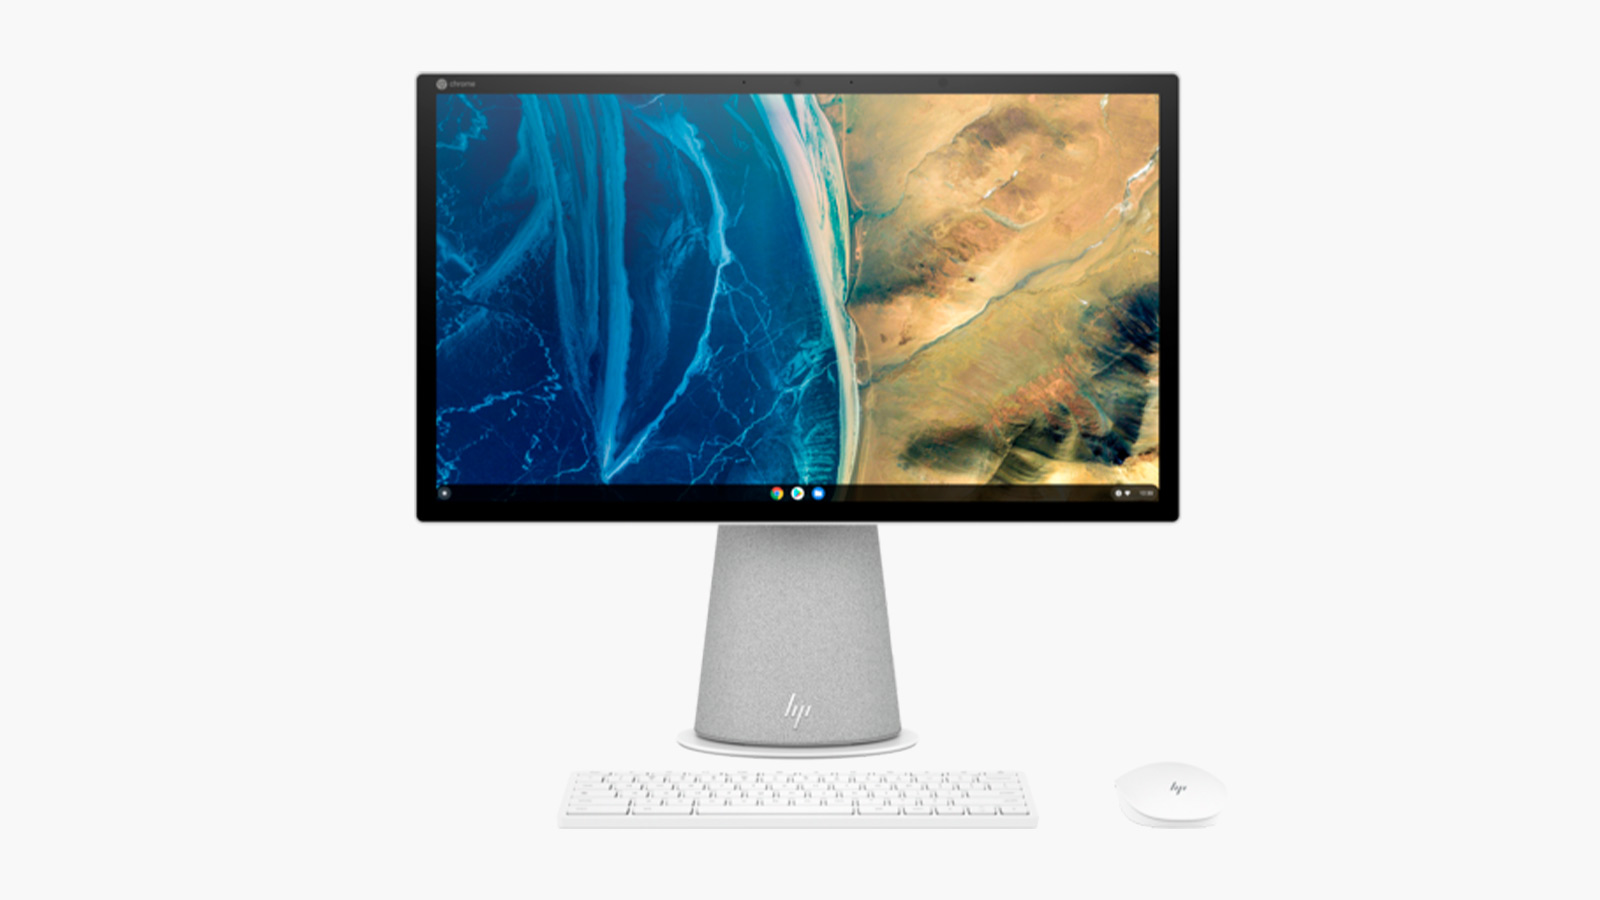 HP Chromebase 21.5 inch All-in-One Desktop